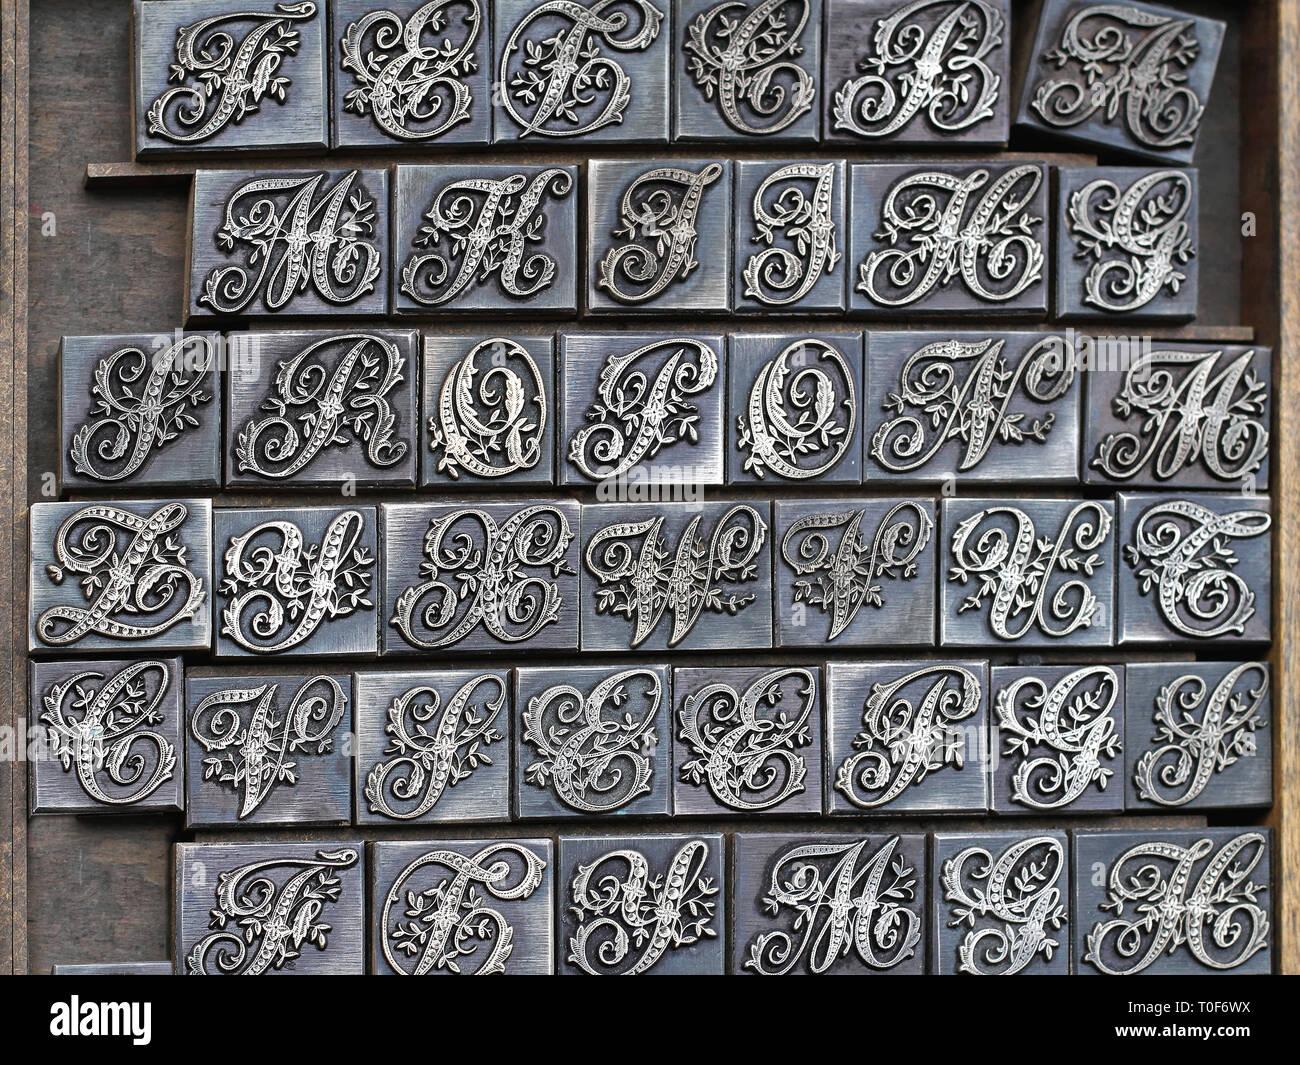 Decorative Retro Type Font for Letterpress Printing - Stock Image